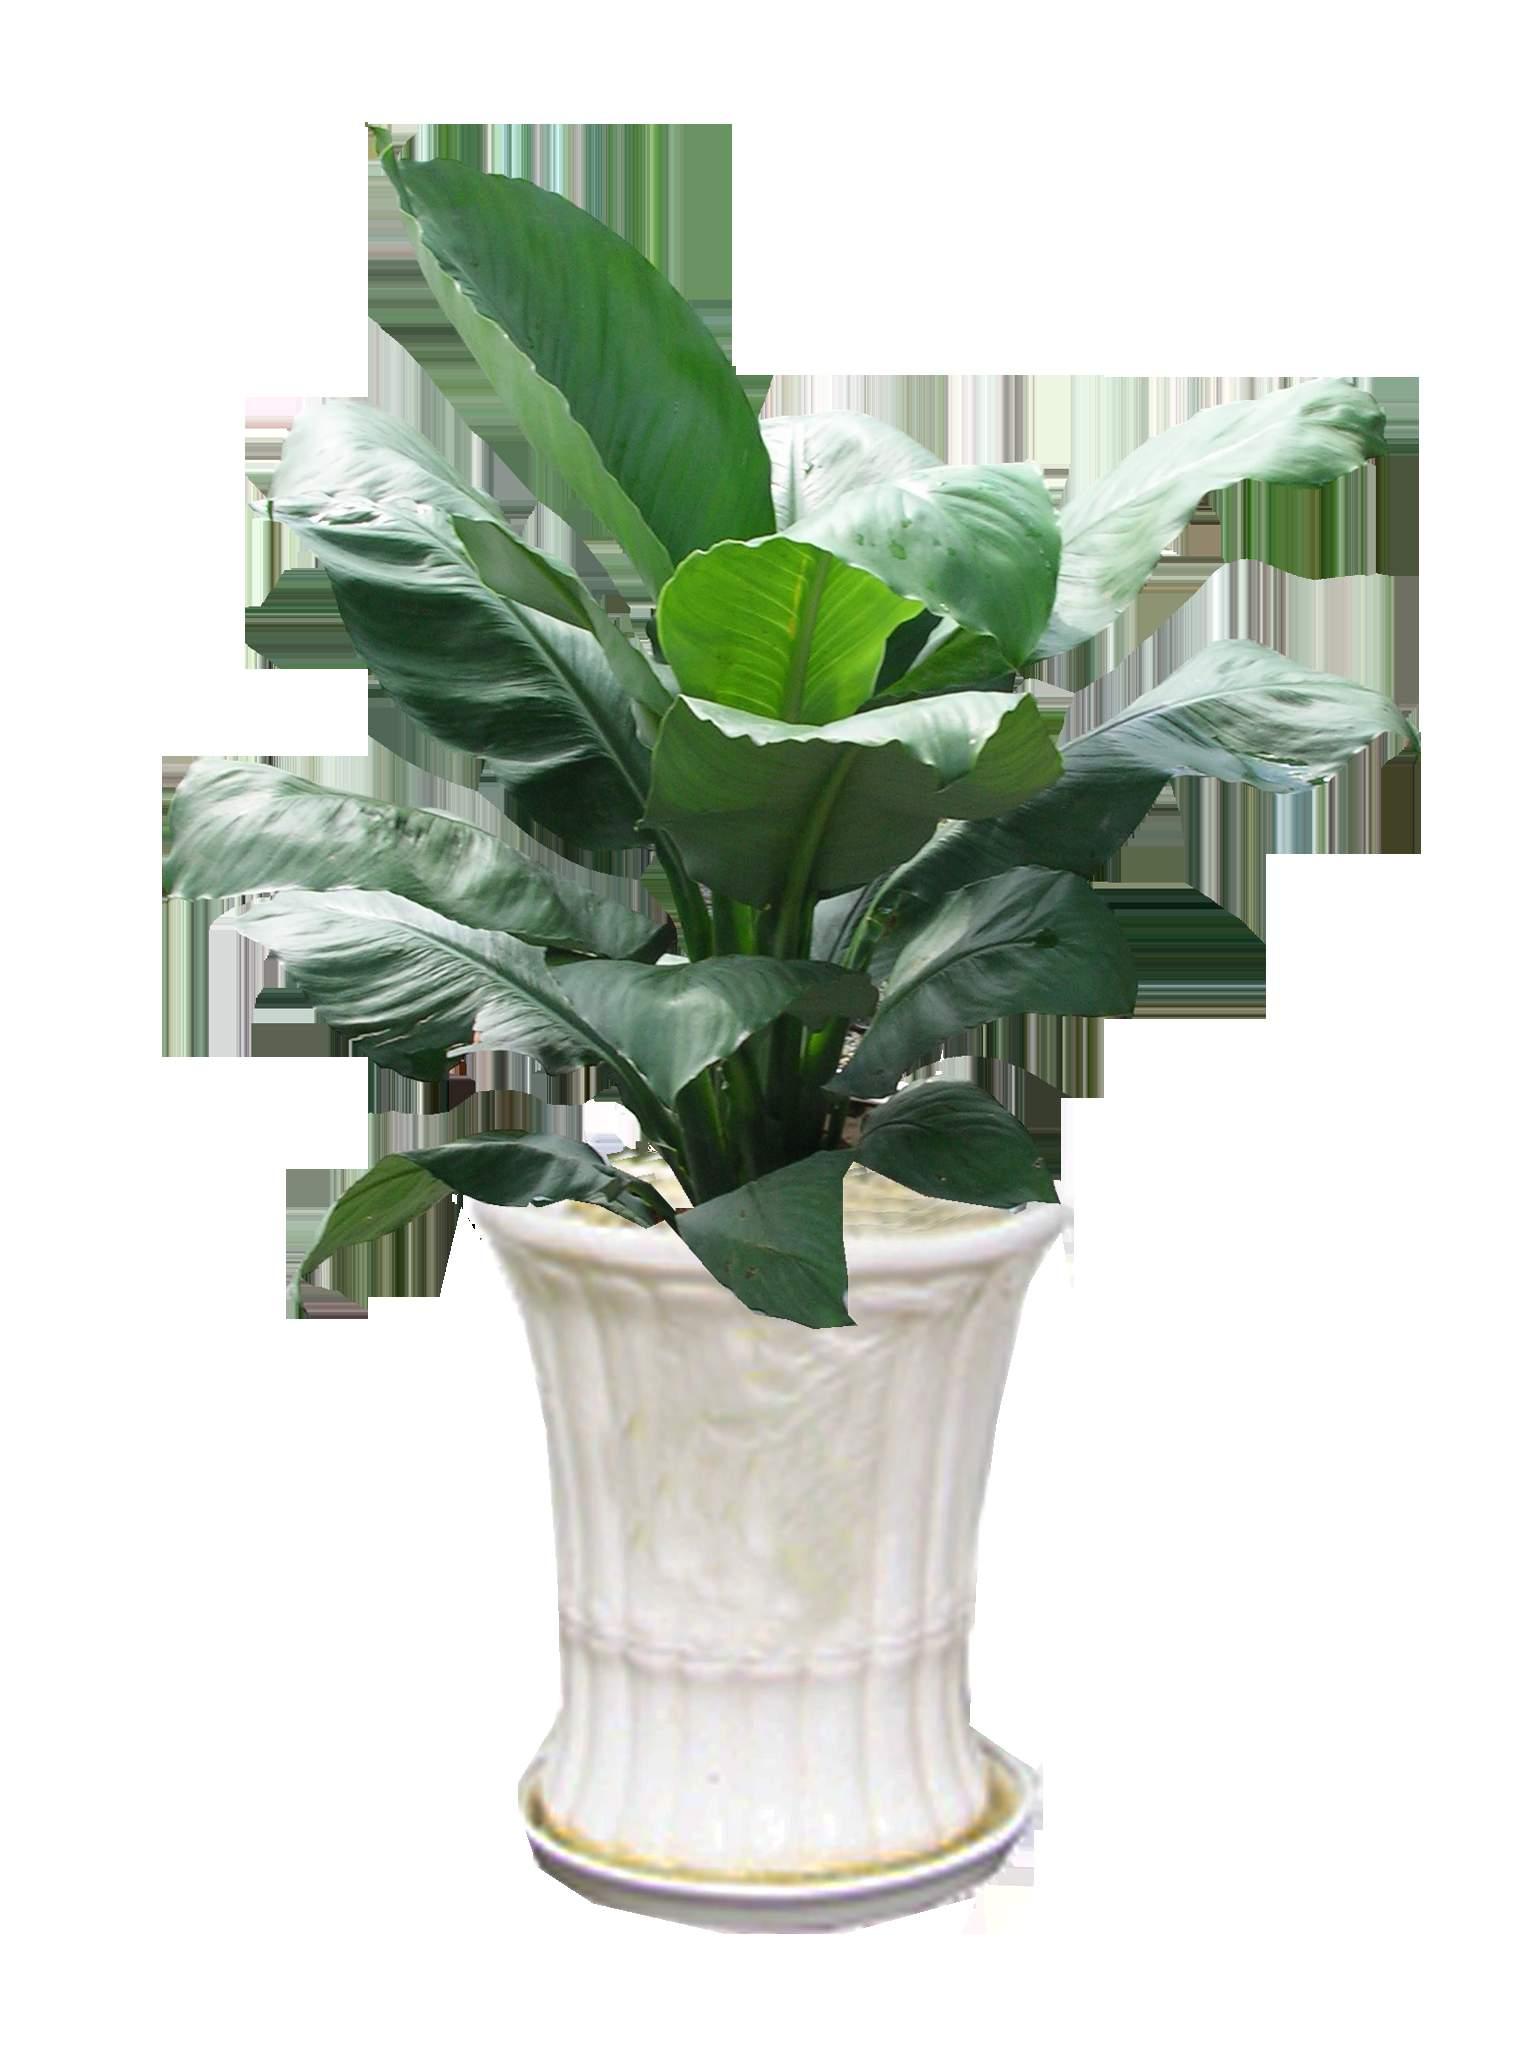 Hoa lan ý mỹ đẹp lung linh